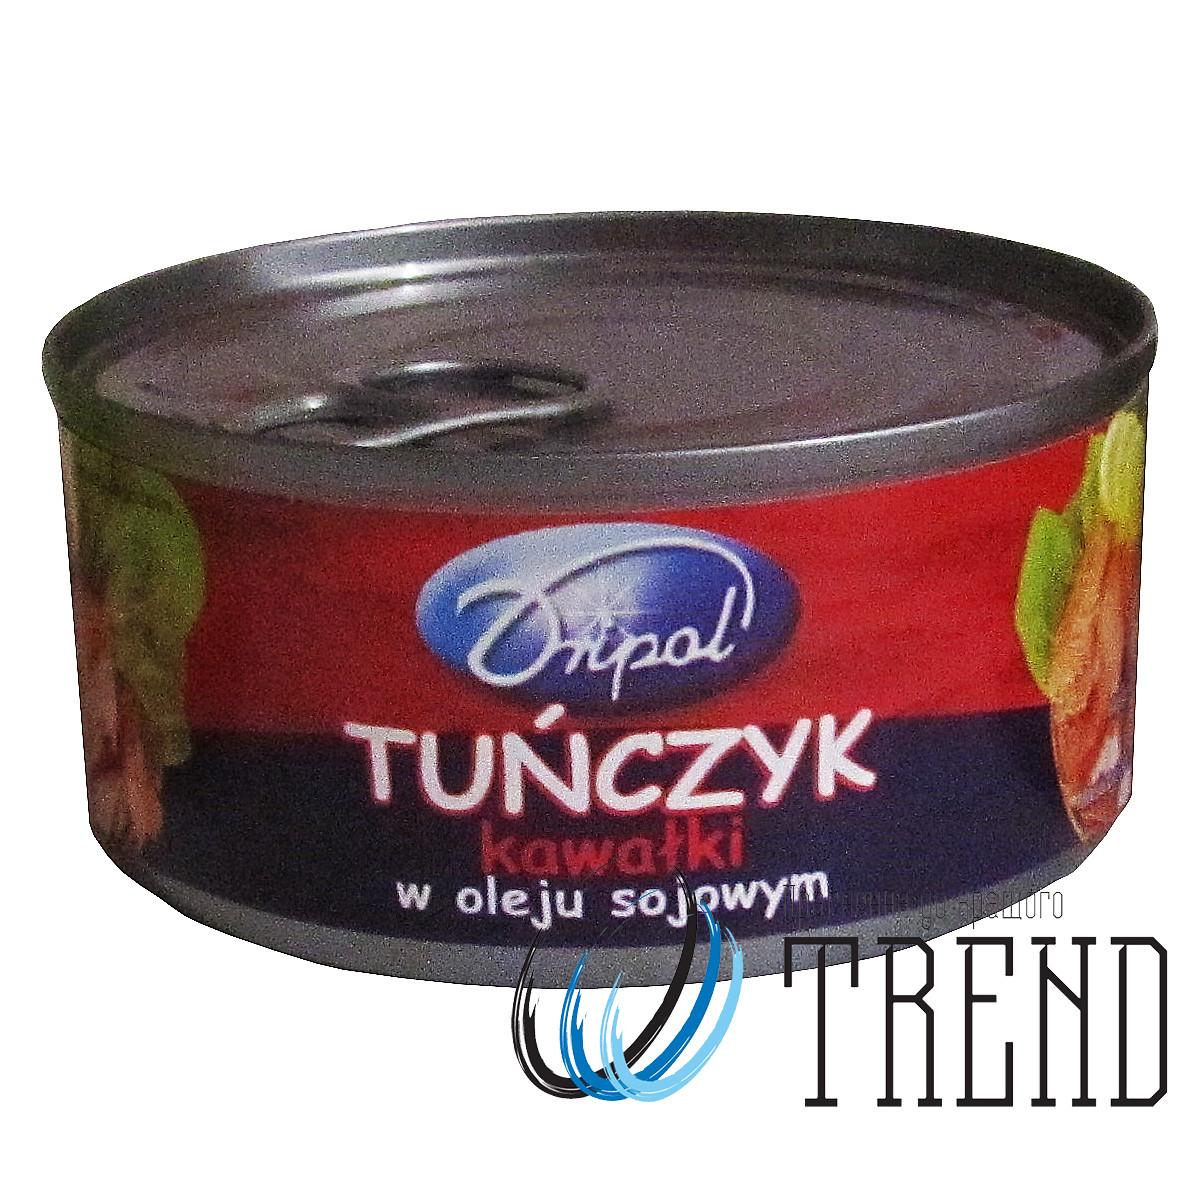 Dripol Tunczyk kawalki v oleju (Тунець в олії куском) 170 гр.,